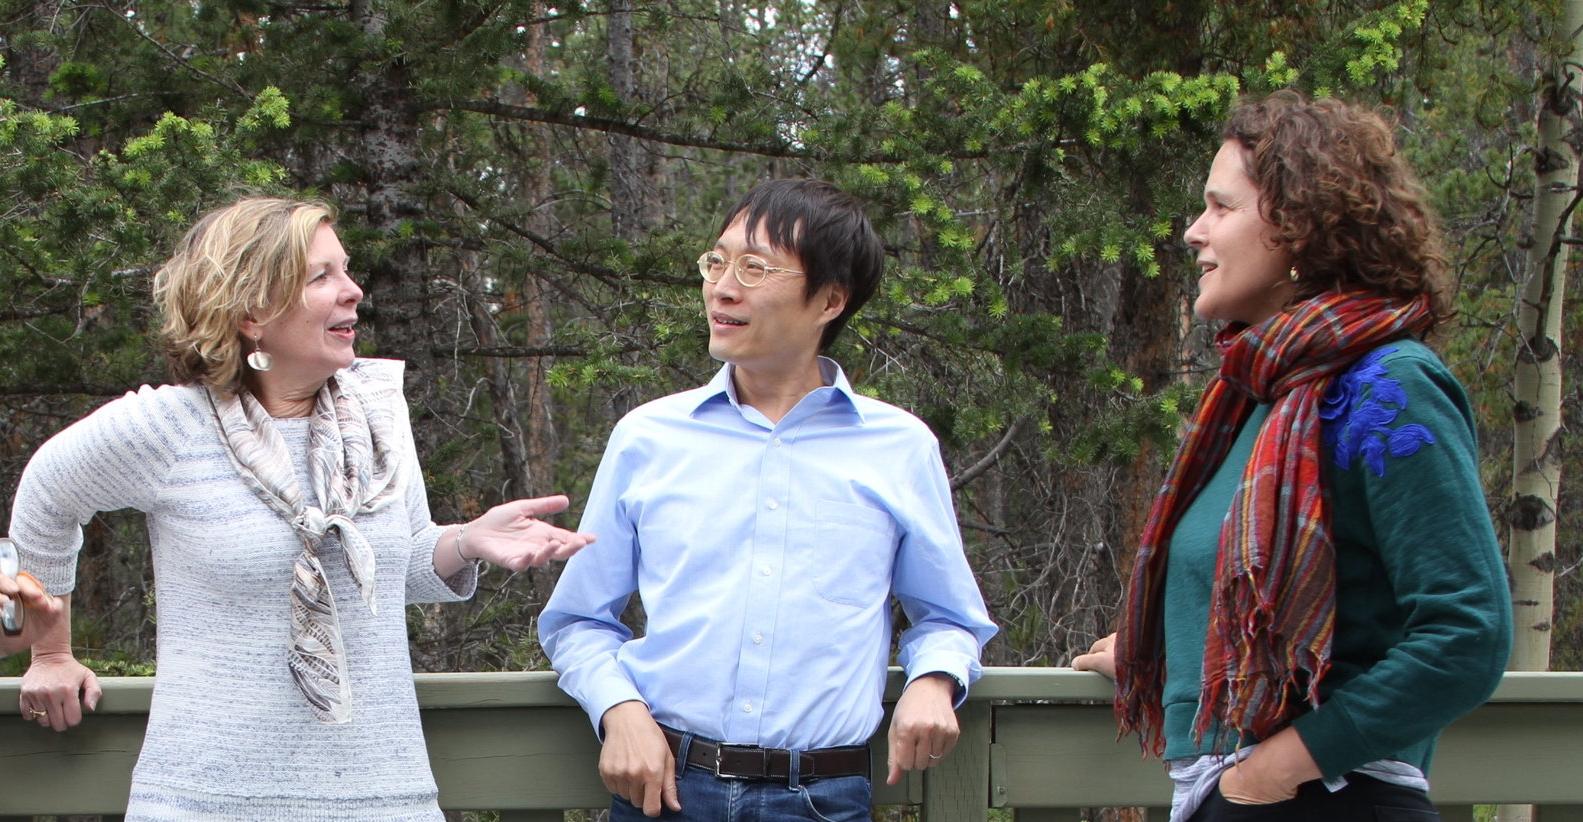 Susan Narucki, Lei Liang and Ligia Bouton